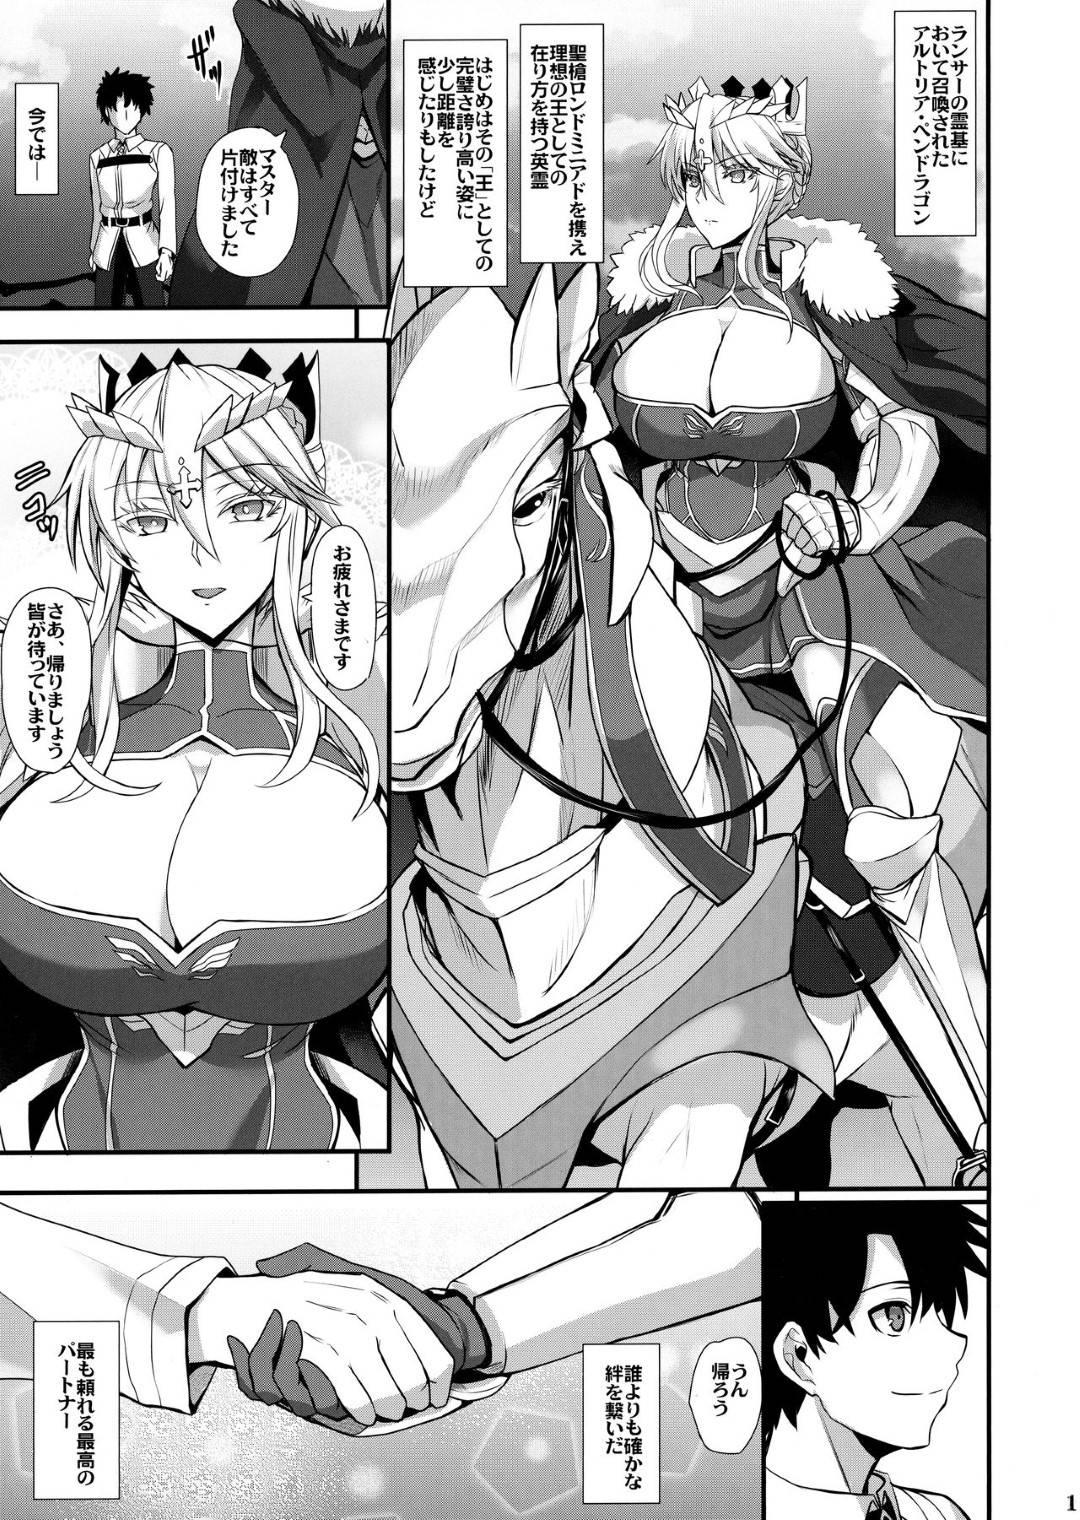 【Fateエロ漫画】発情したアルトリアに迫られた主人公。彼女は魔力補給と称してセックスを迫ってフェラで口内射精させる。その後はバックや正常位などの体位でチンポを受け入れて中出しイチャラブセックスするのだった。【隈吉】